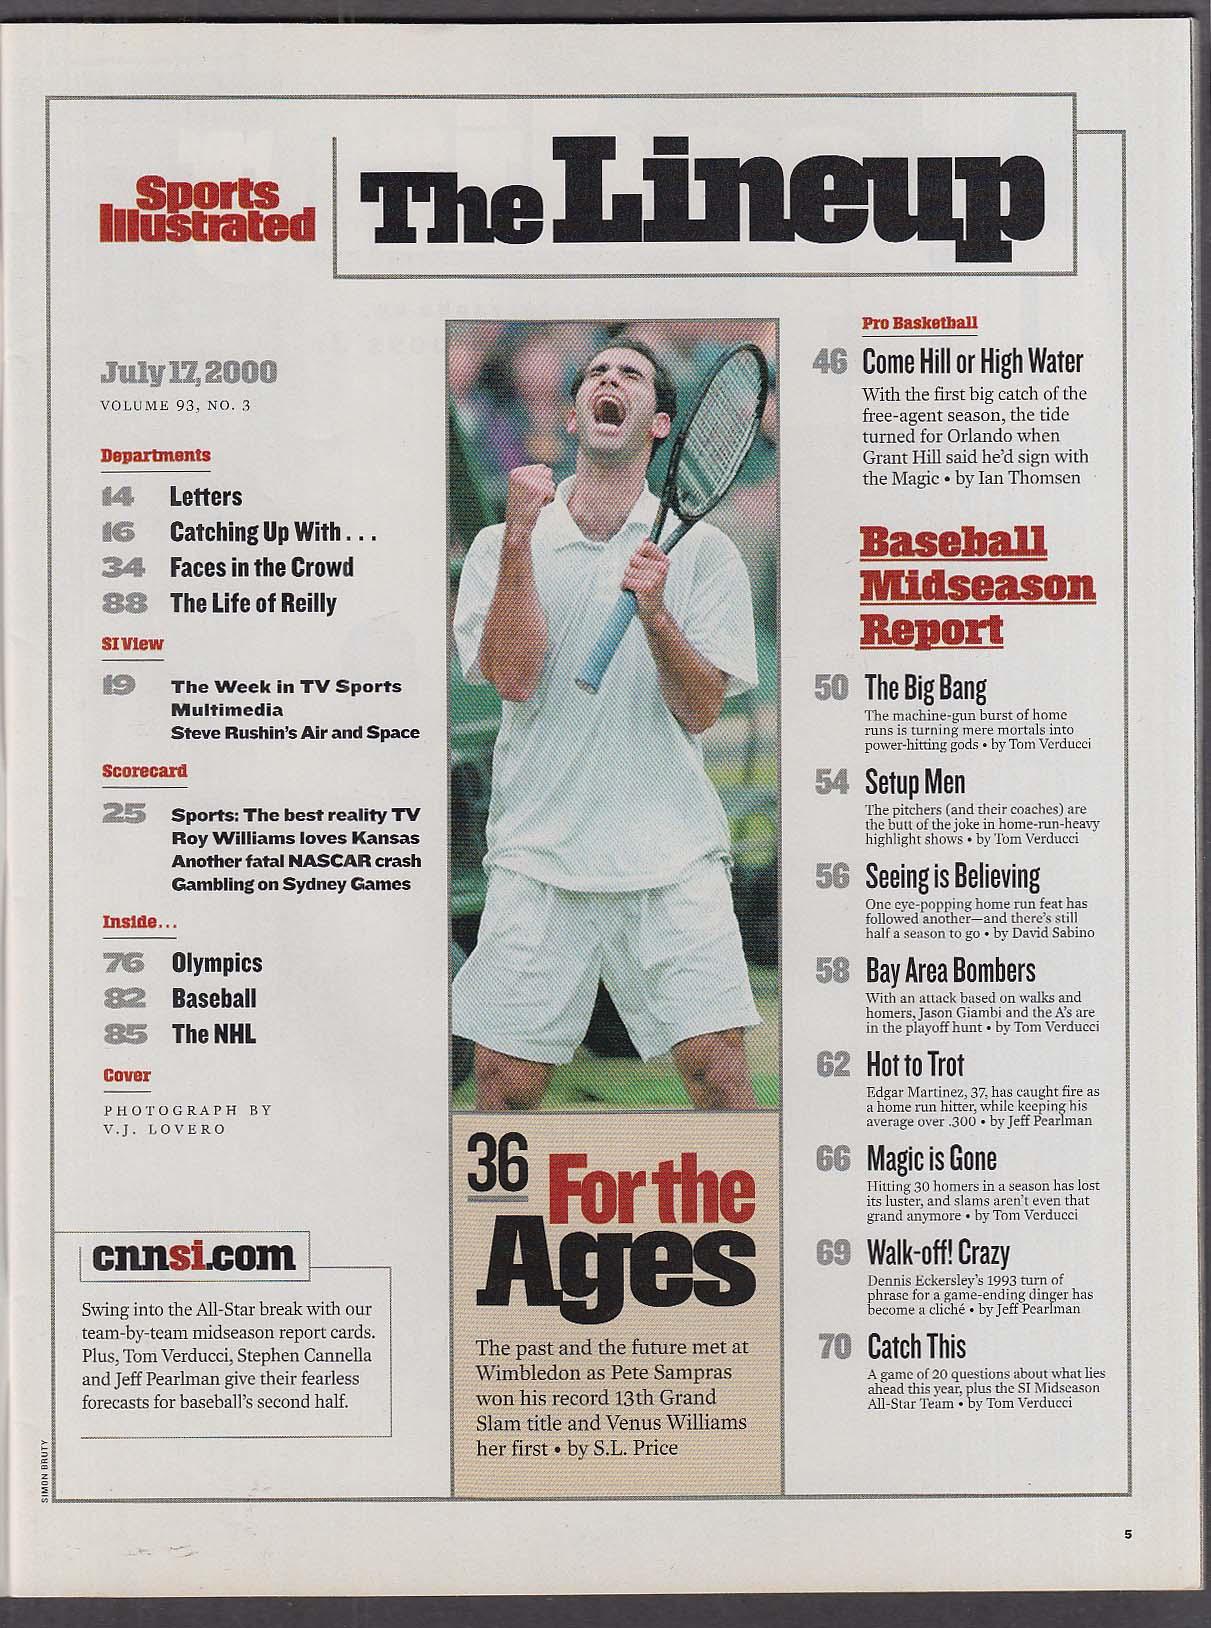 SPORTS ILLUSTRATED Jason Giambi Pete Sampras Wimbledon Grant Hill ++ 7/17 2000